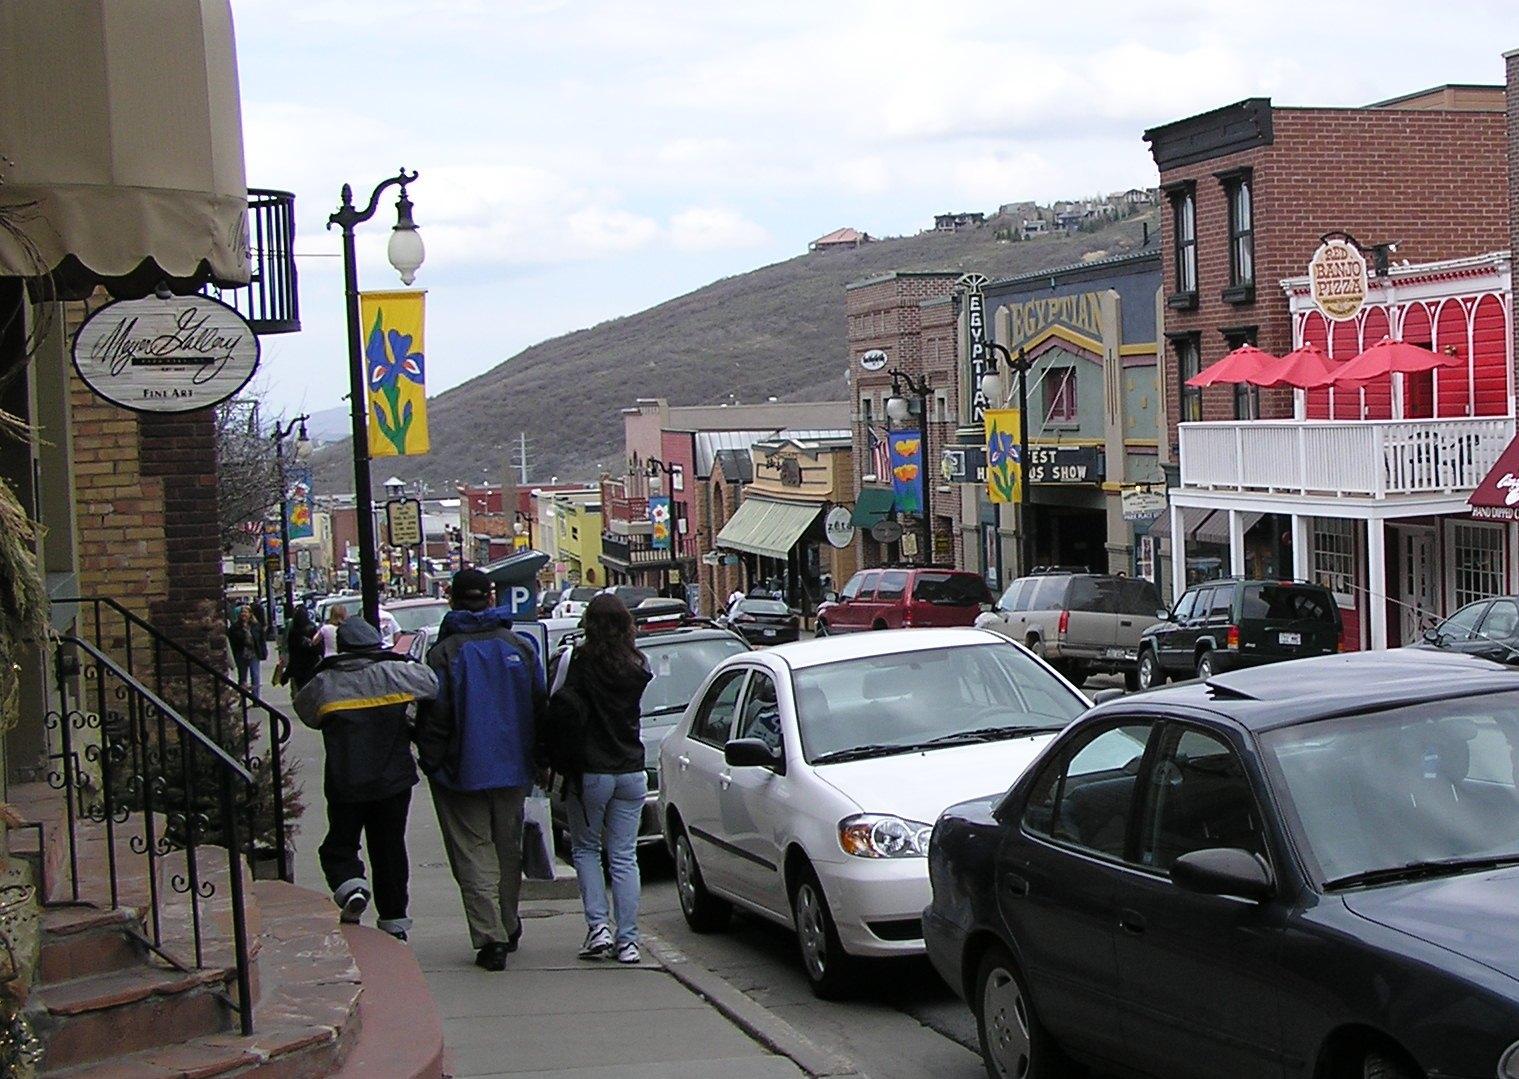 Looking down main street in Park City, Utah, USA